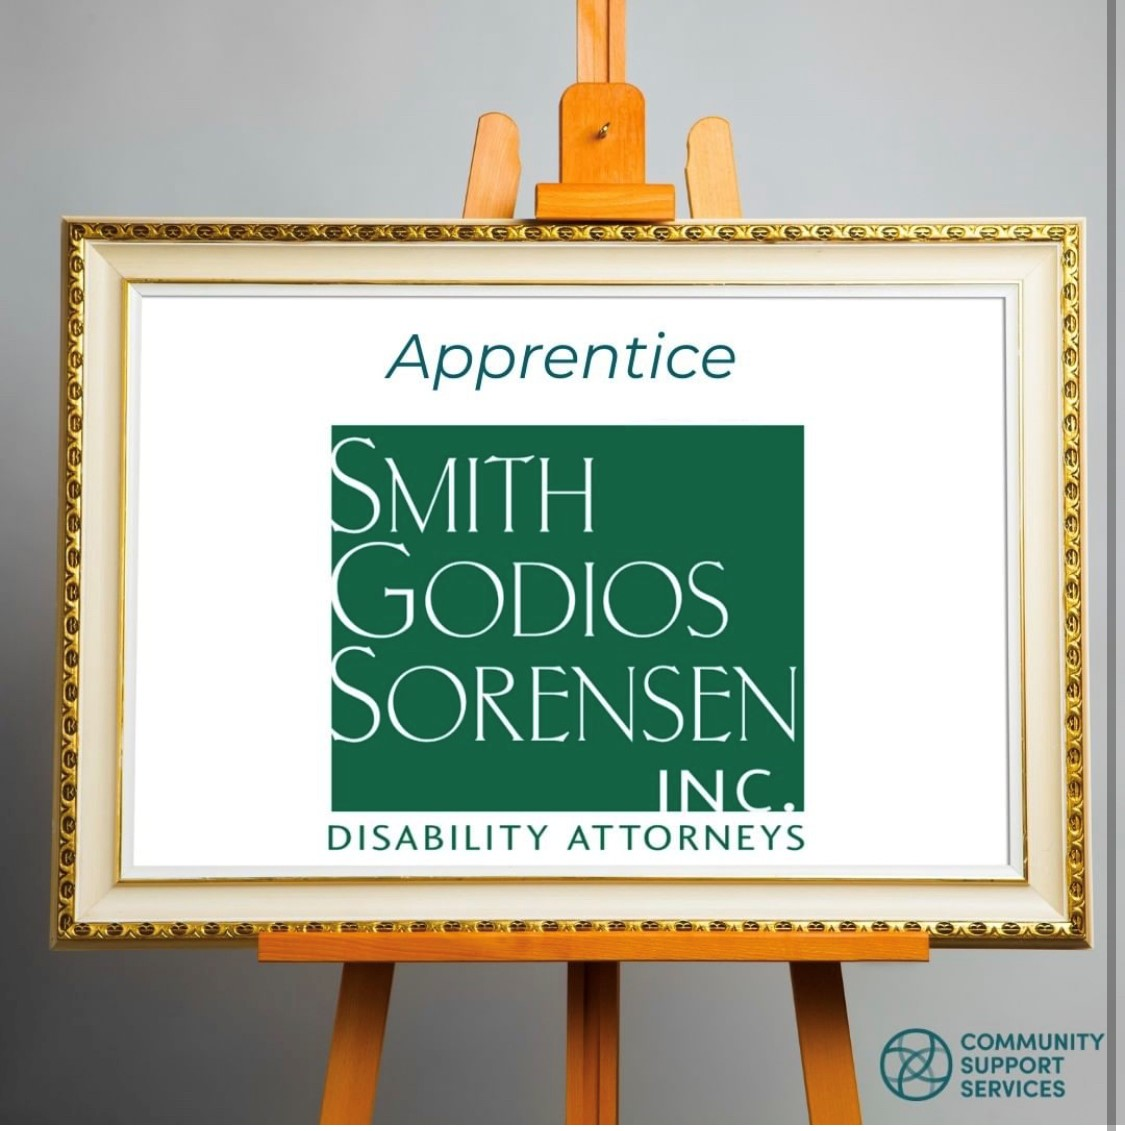 Smith Godios Sorensen Inc. Sponsors CSS Art of Recovery Event